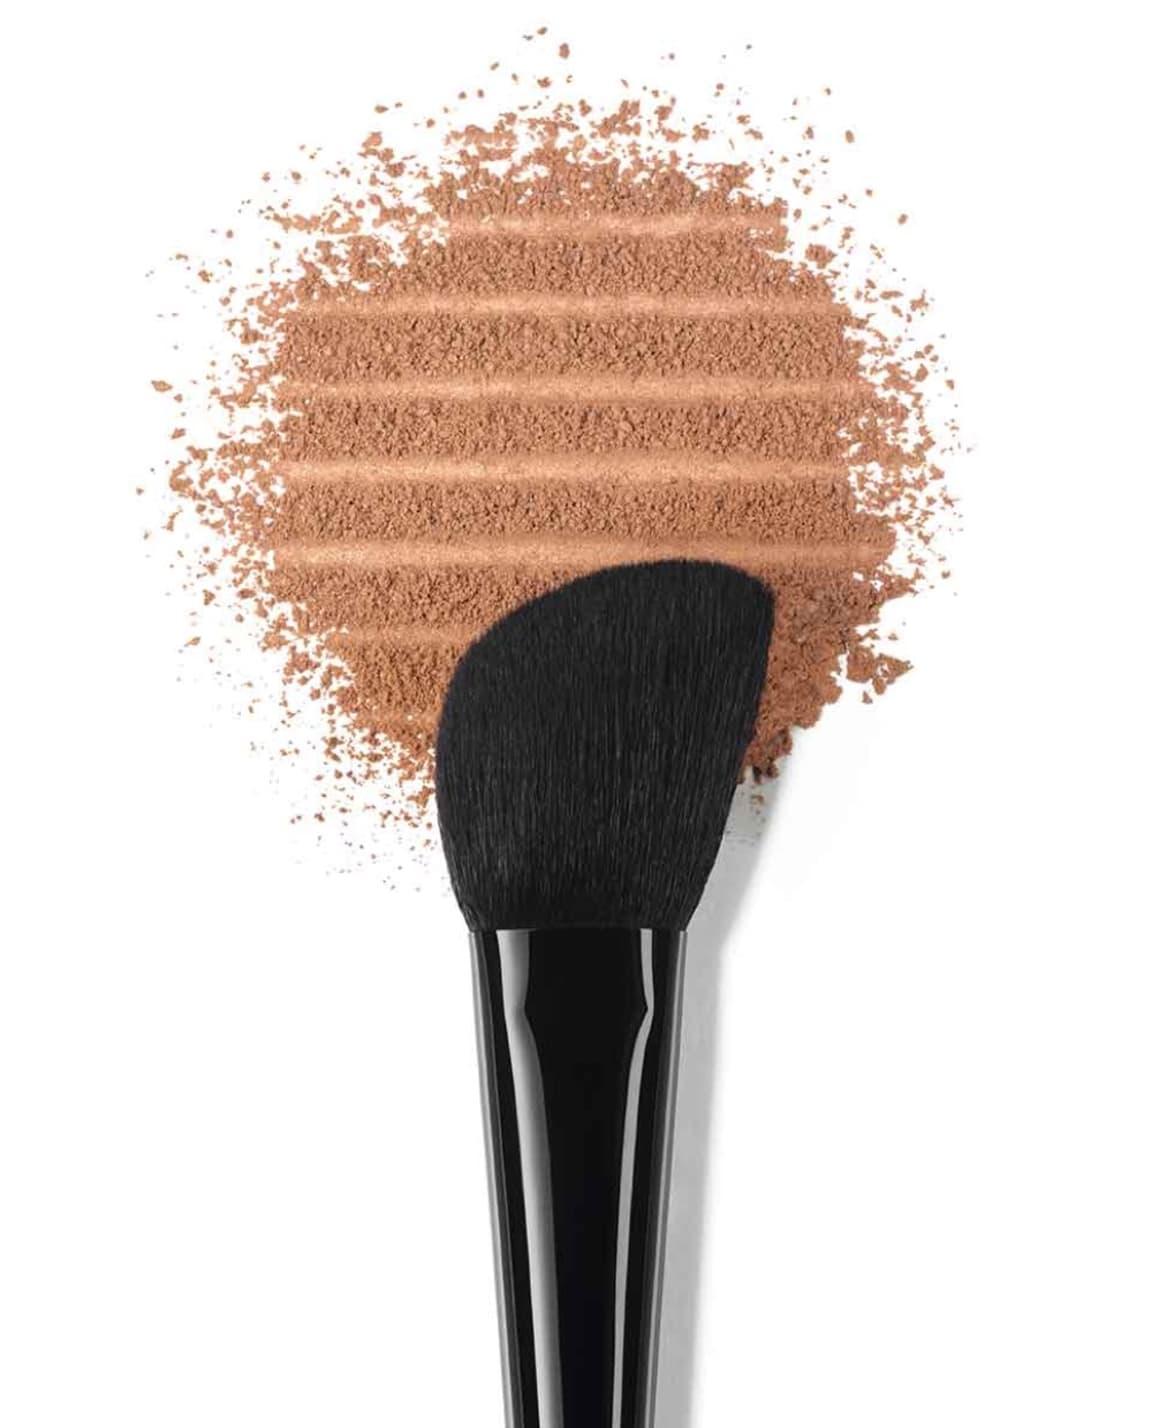 PINCEAU CONTOUR Contouring Brush Complexion Brushes | CHANEL